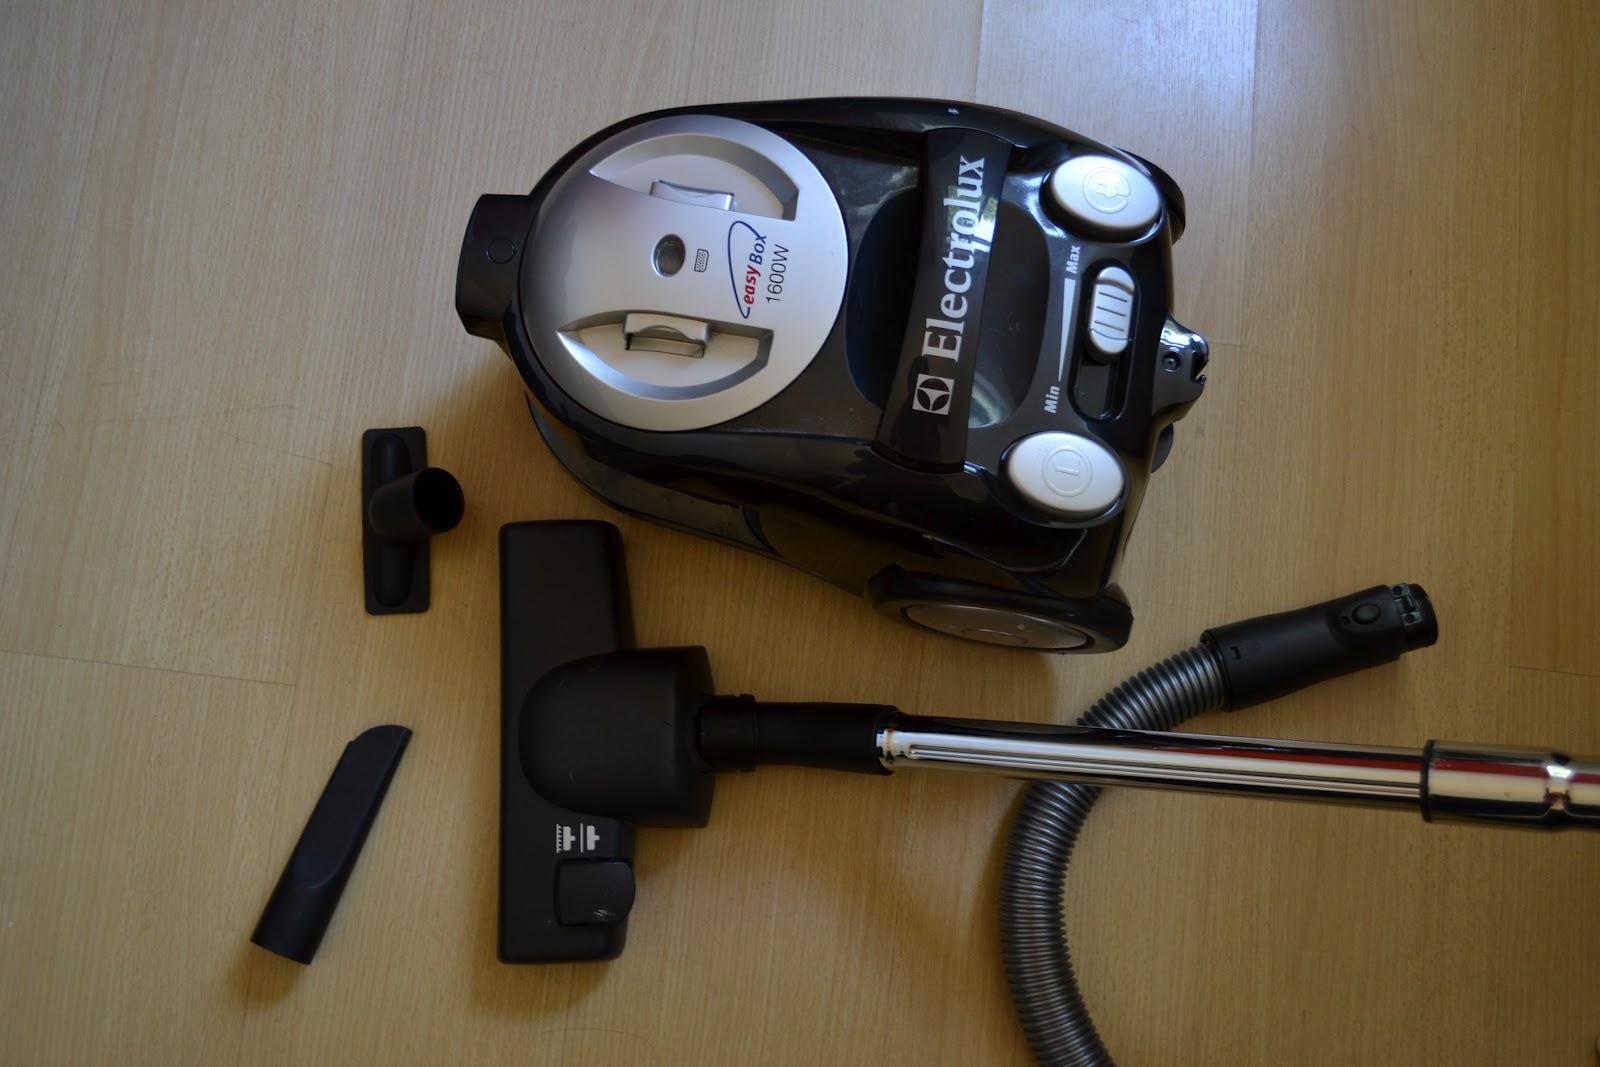 16a04665b SubAspira  Aspirador de Pó Electrolux 1600W Filtro Hepa-R  189